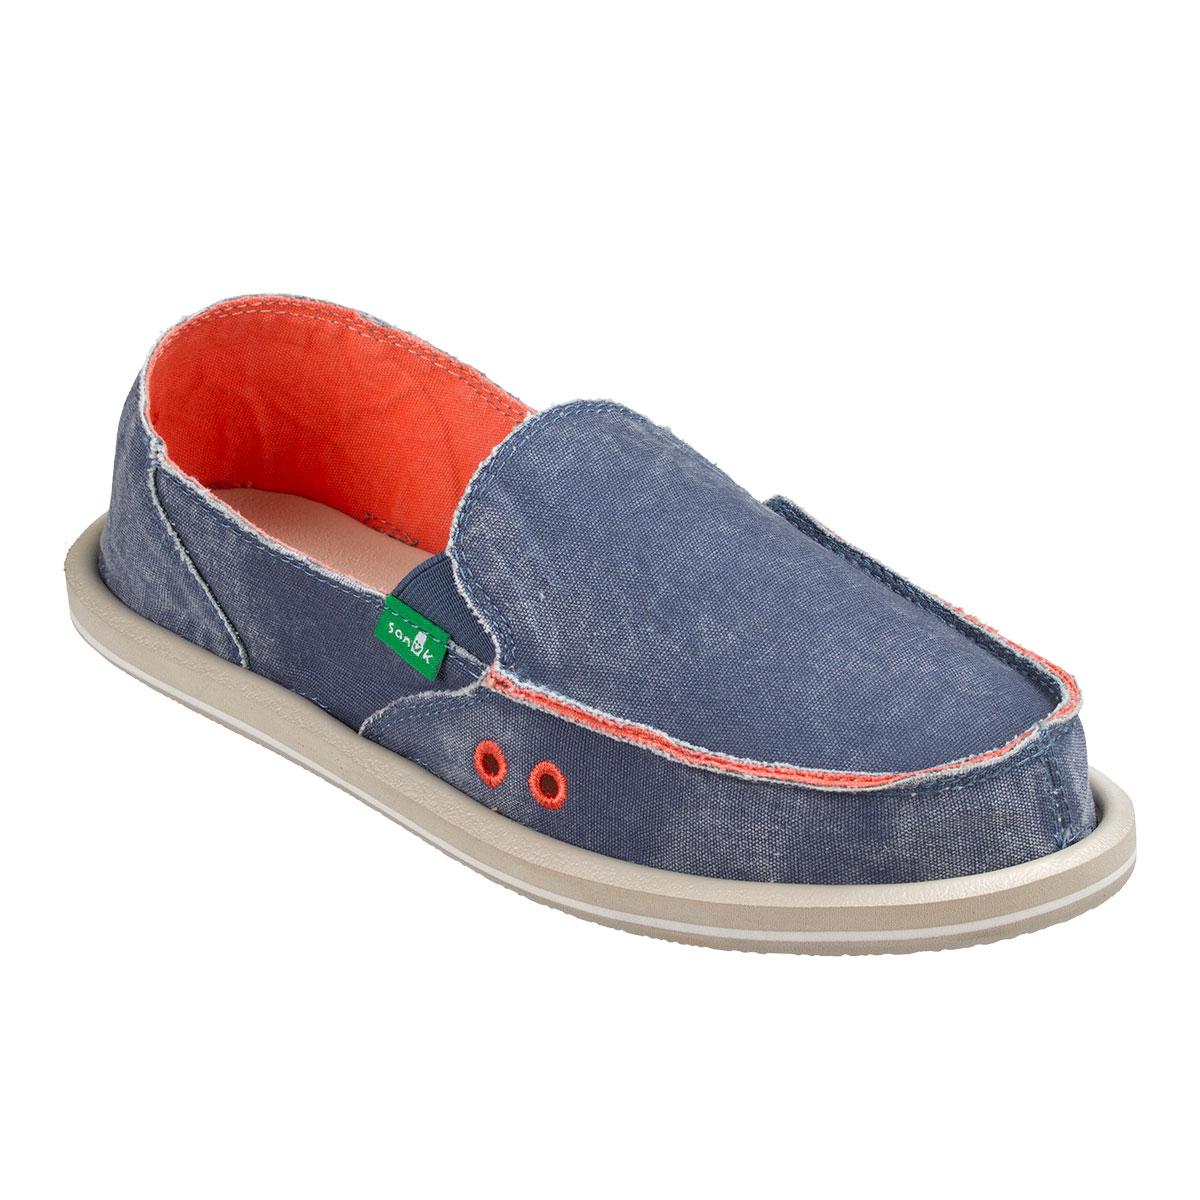 e90accc589f5a7 Sanuk Swf11137 SLTB Donna Distressed Slate Blue Ladies Shoes Size 6 ...